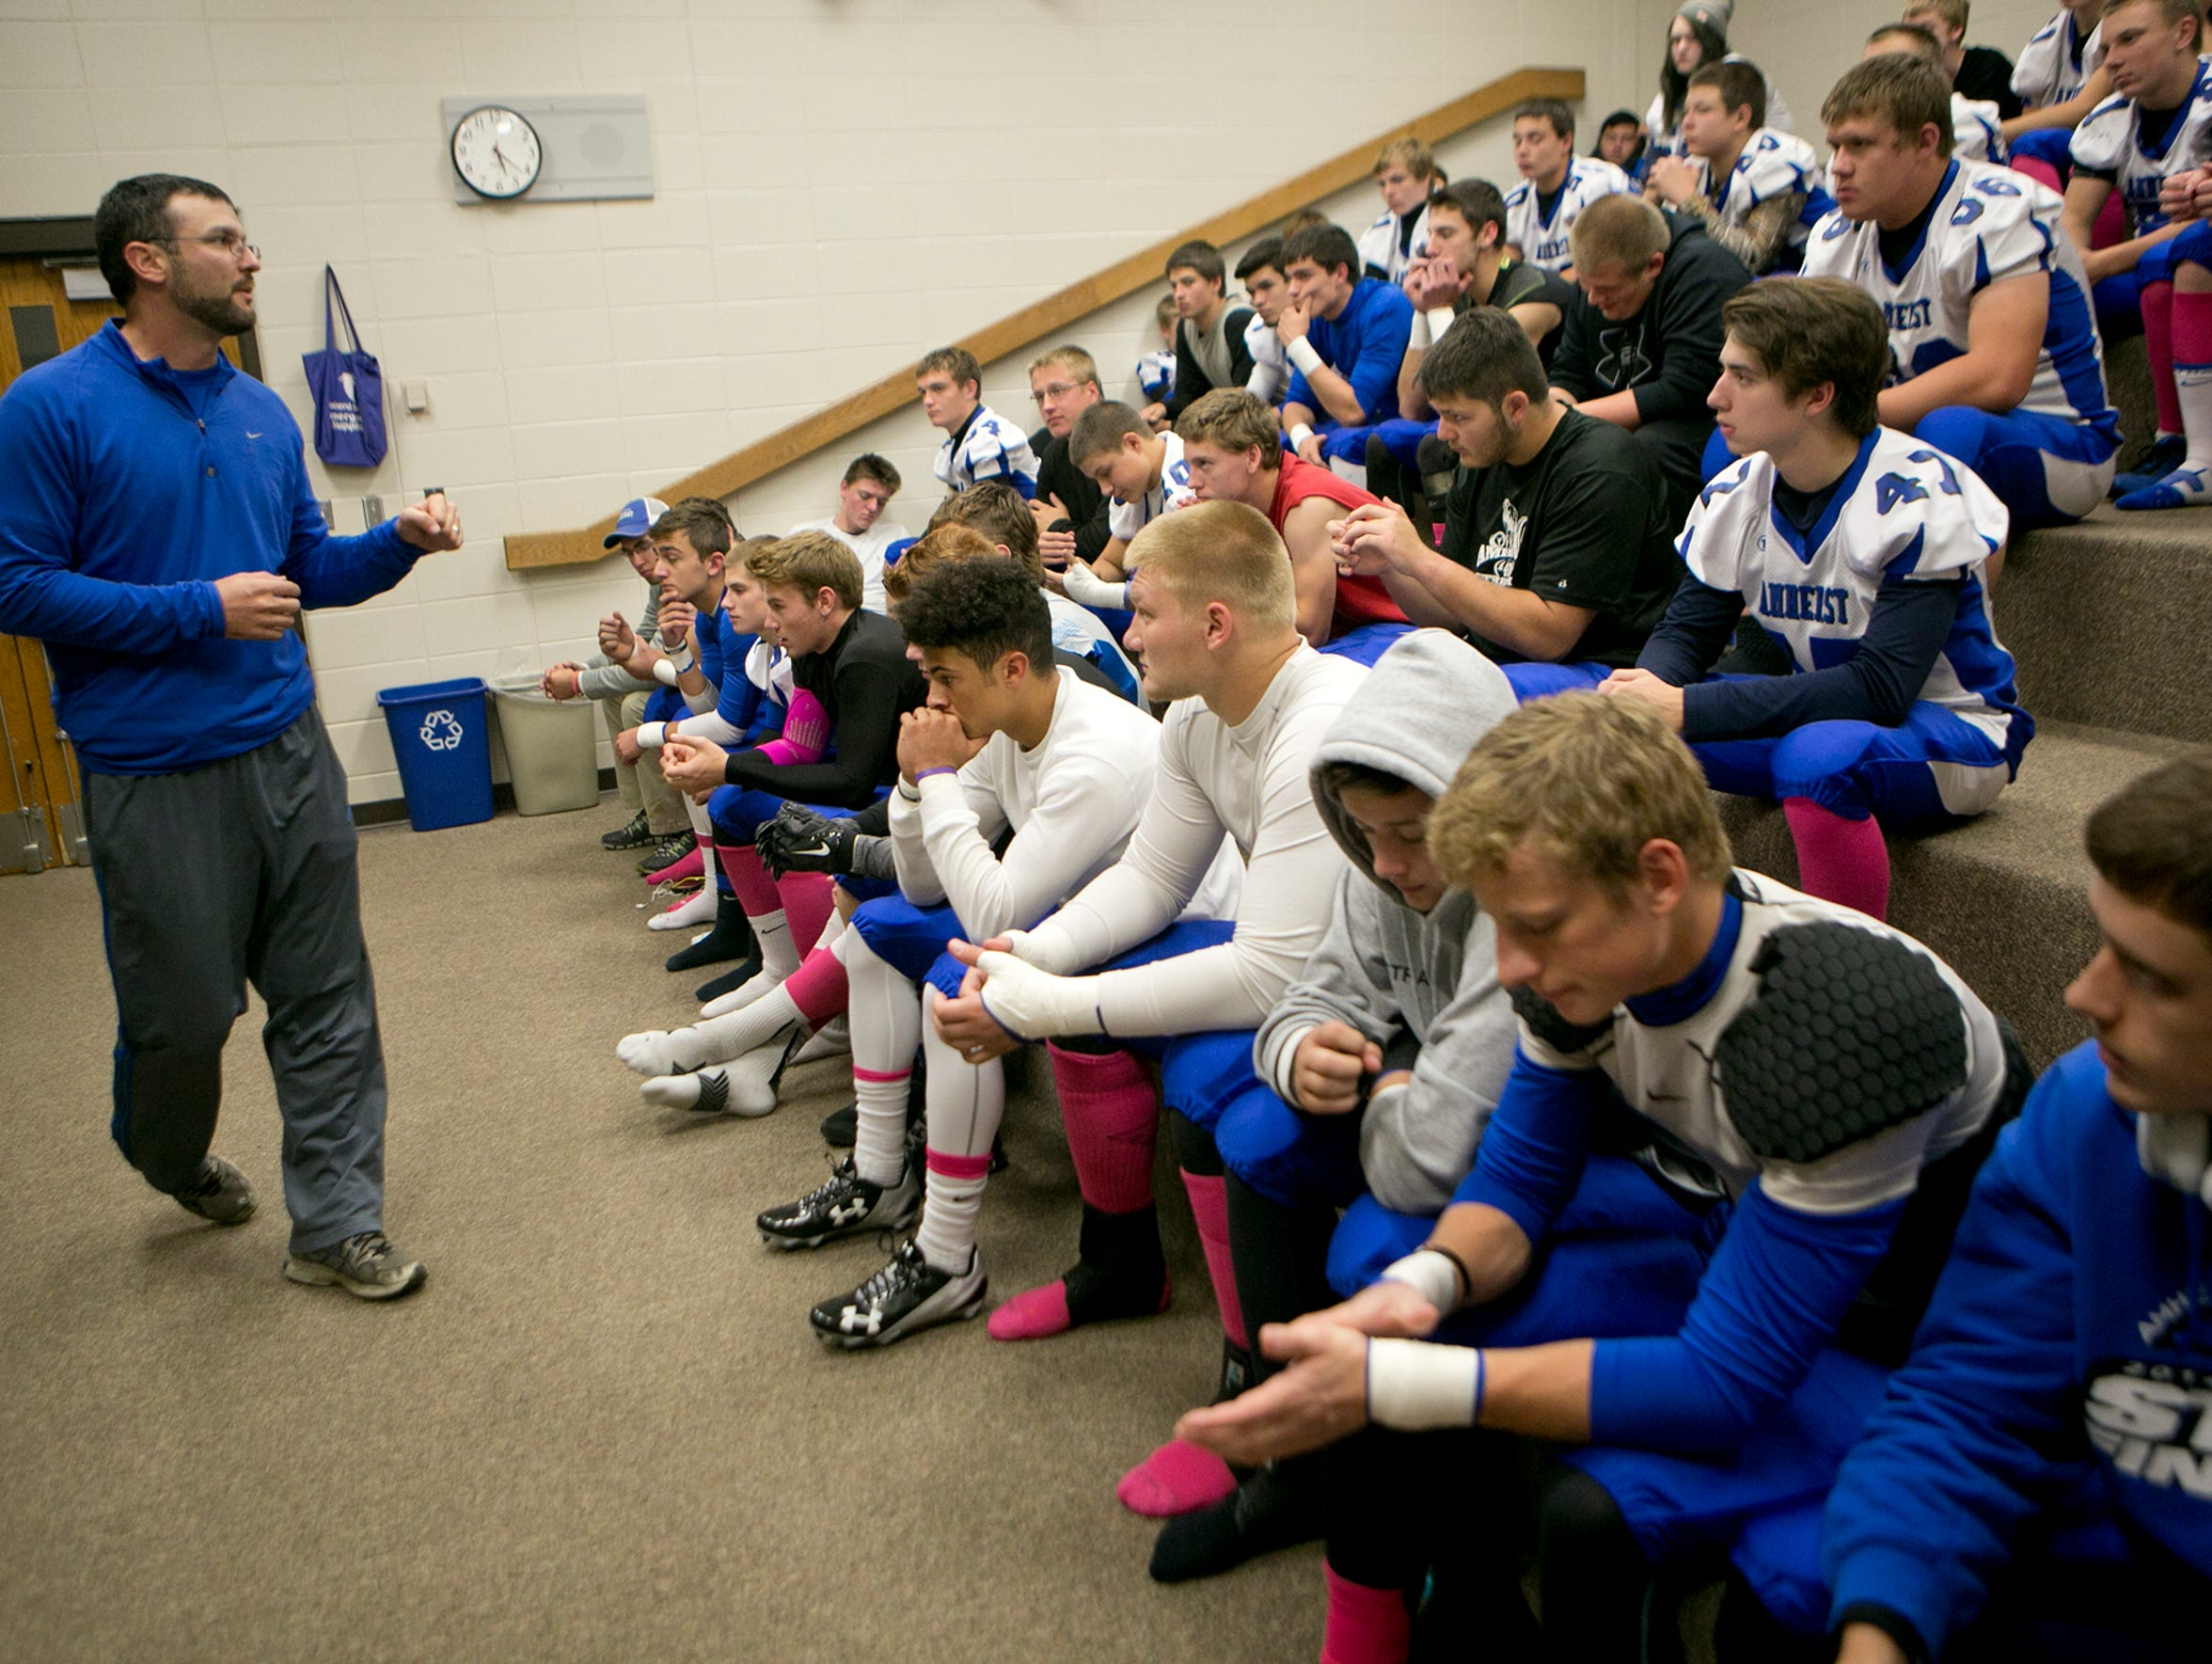 Amherst head coach Mark Lusic address the football